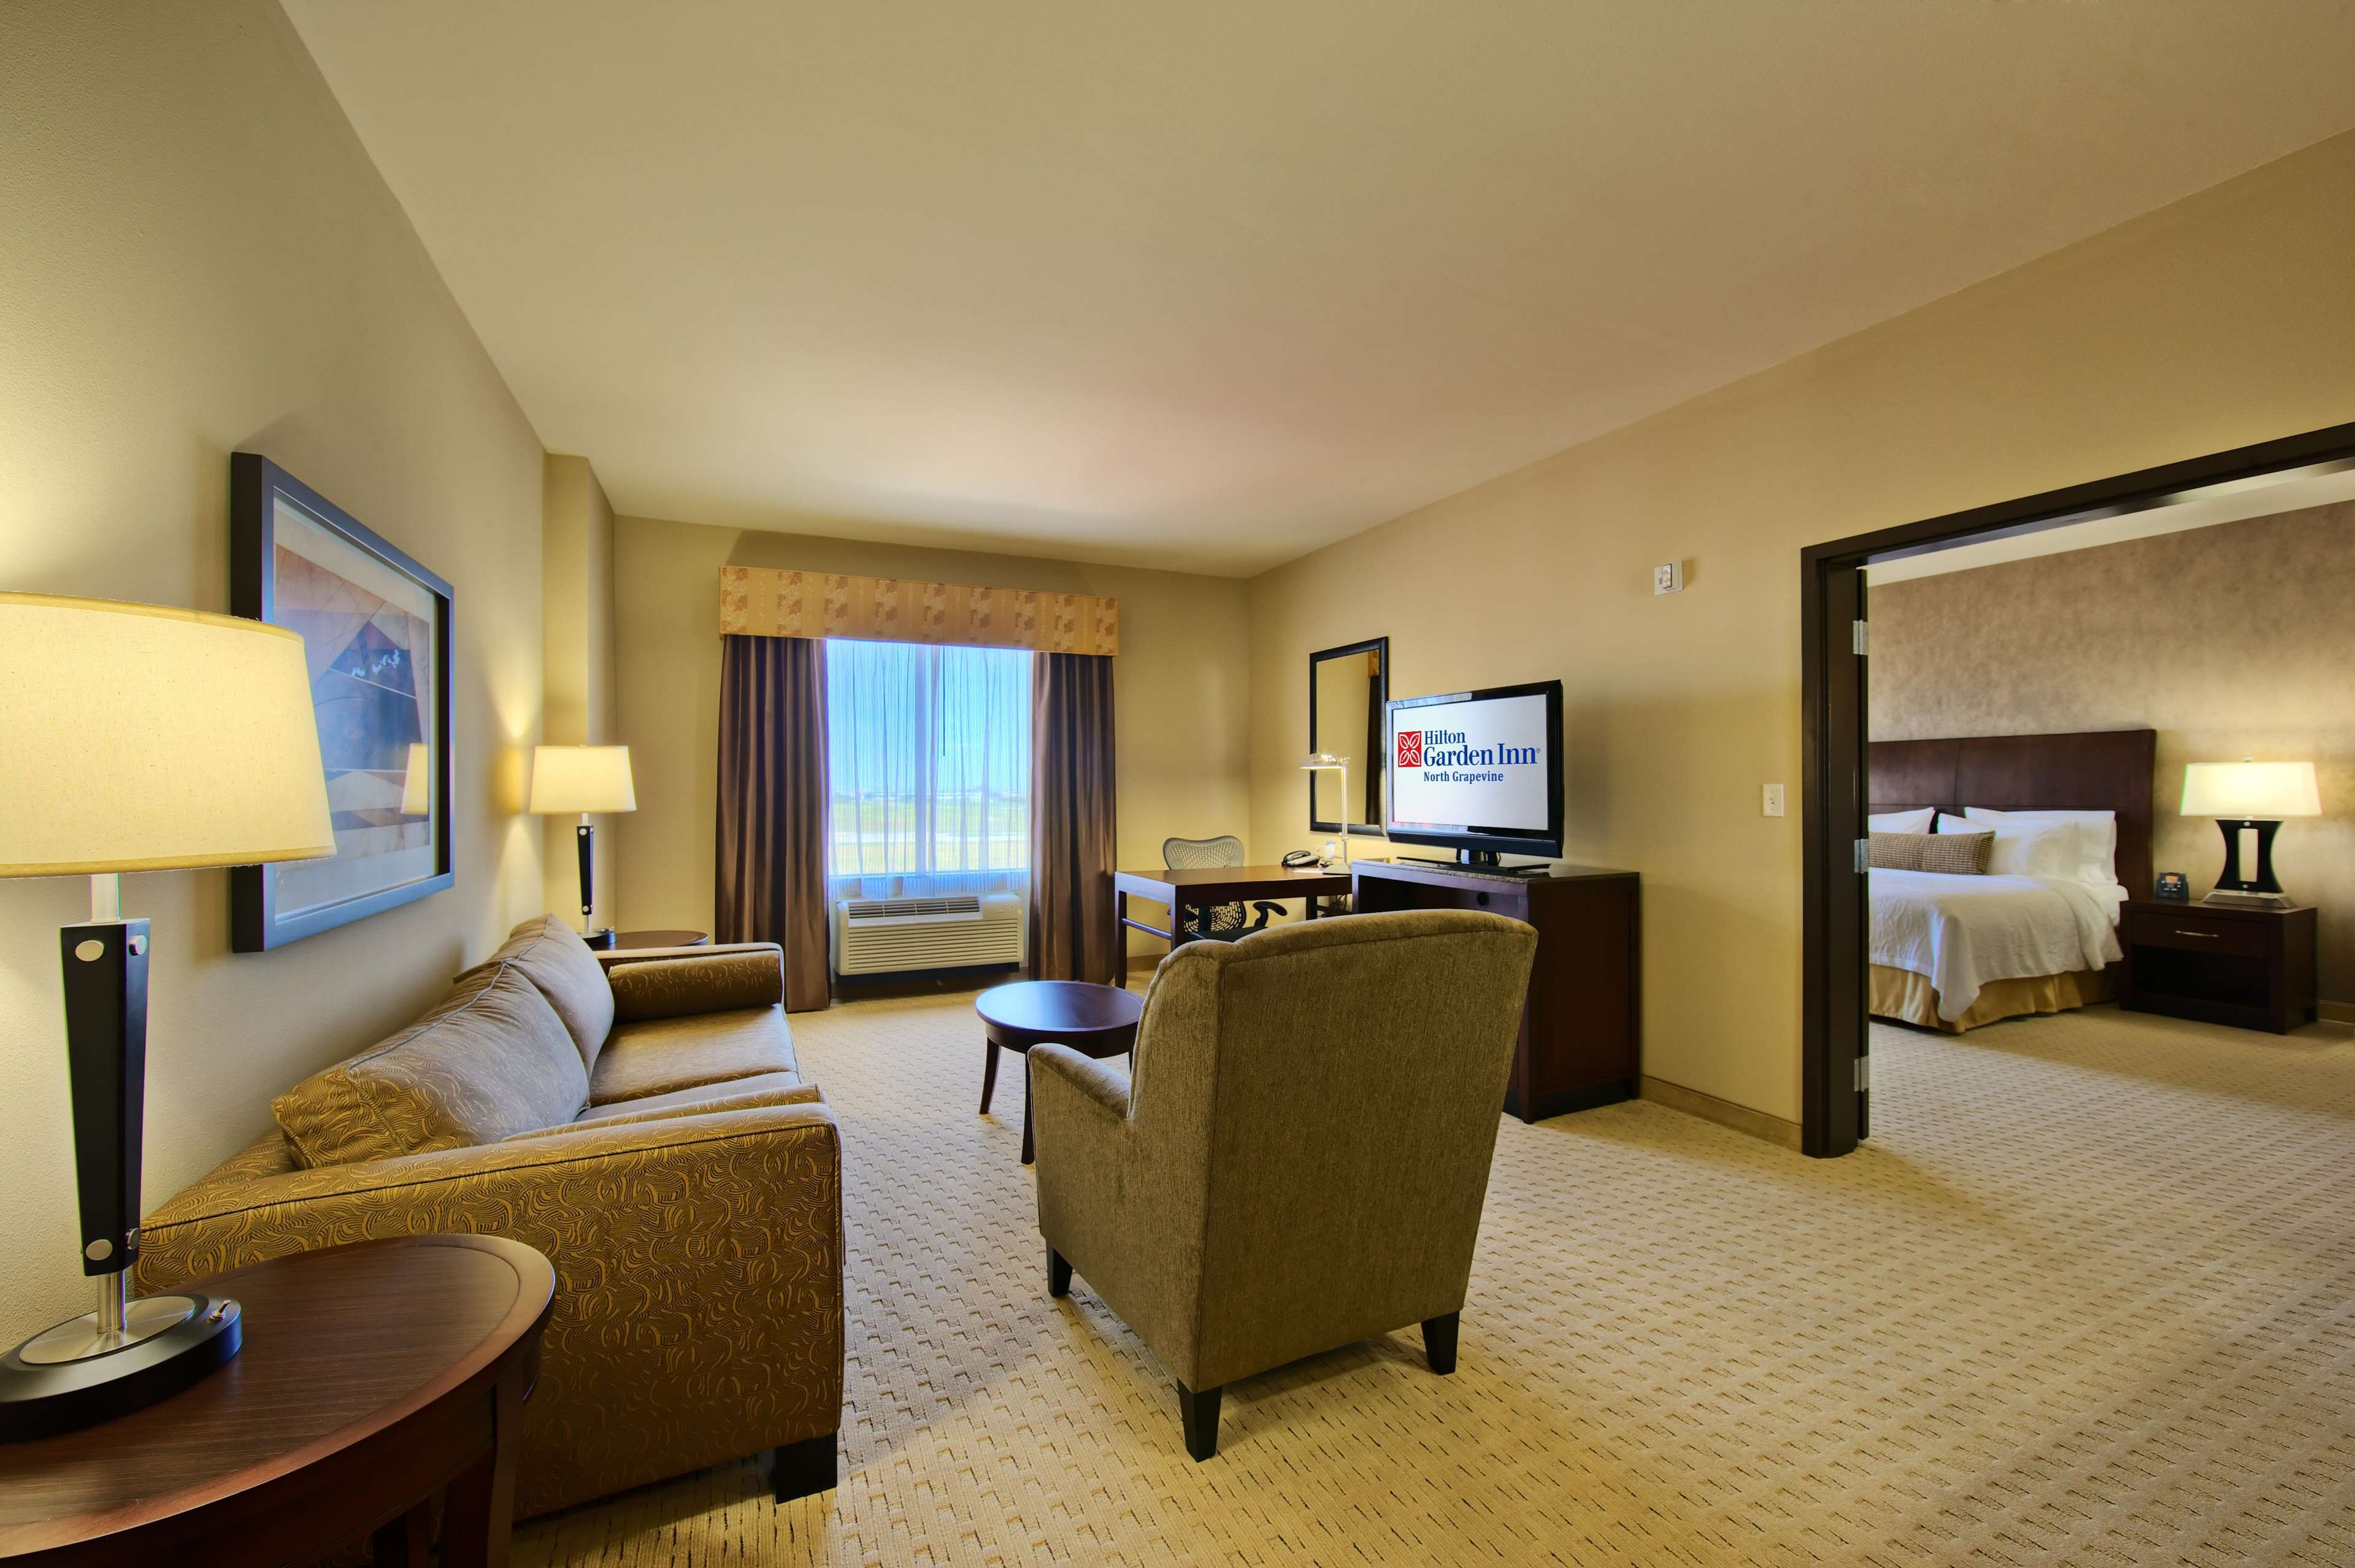 Hilton Garden Inn DFW North Grapevine image 18